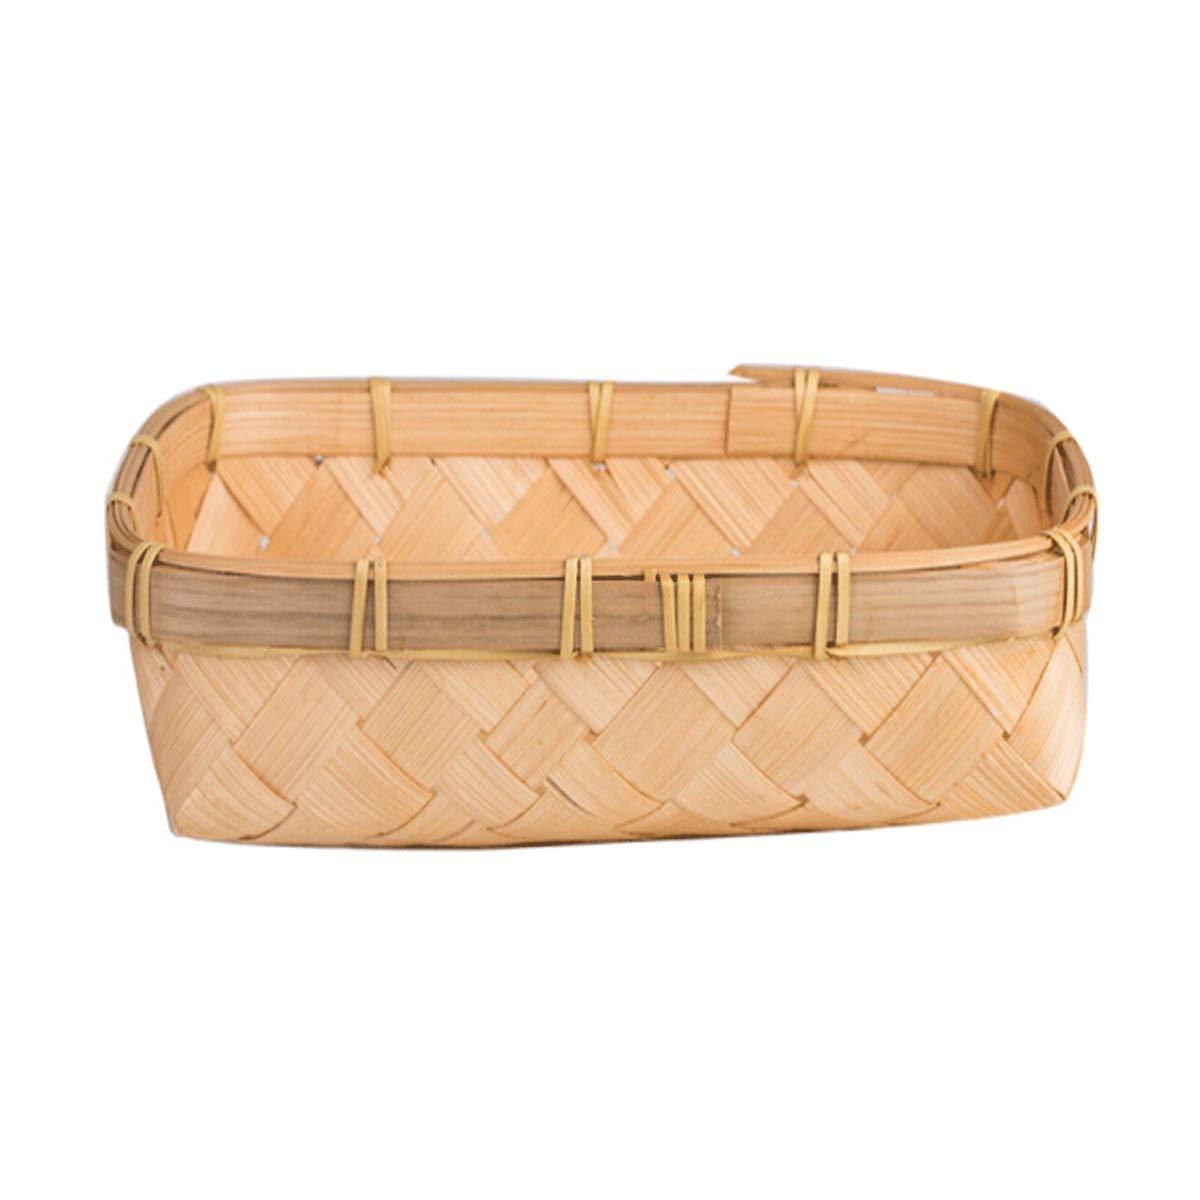 Muziwenju Handmade Woven Basket, Bread Basket, Creative Fruit Basket, Rattan Picnic Basket, Vegetable Basket, Rectangular Bamboo Basket,